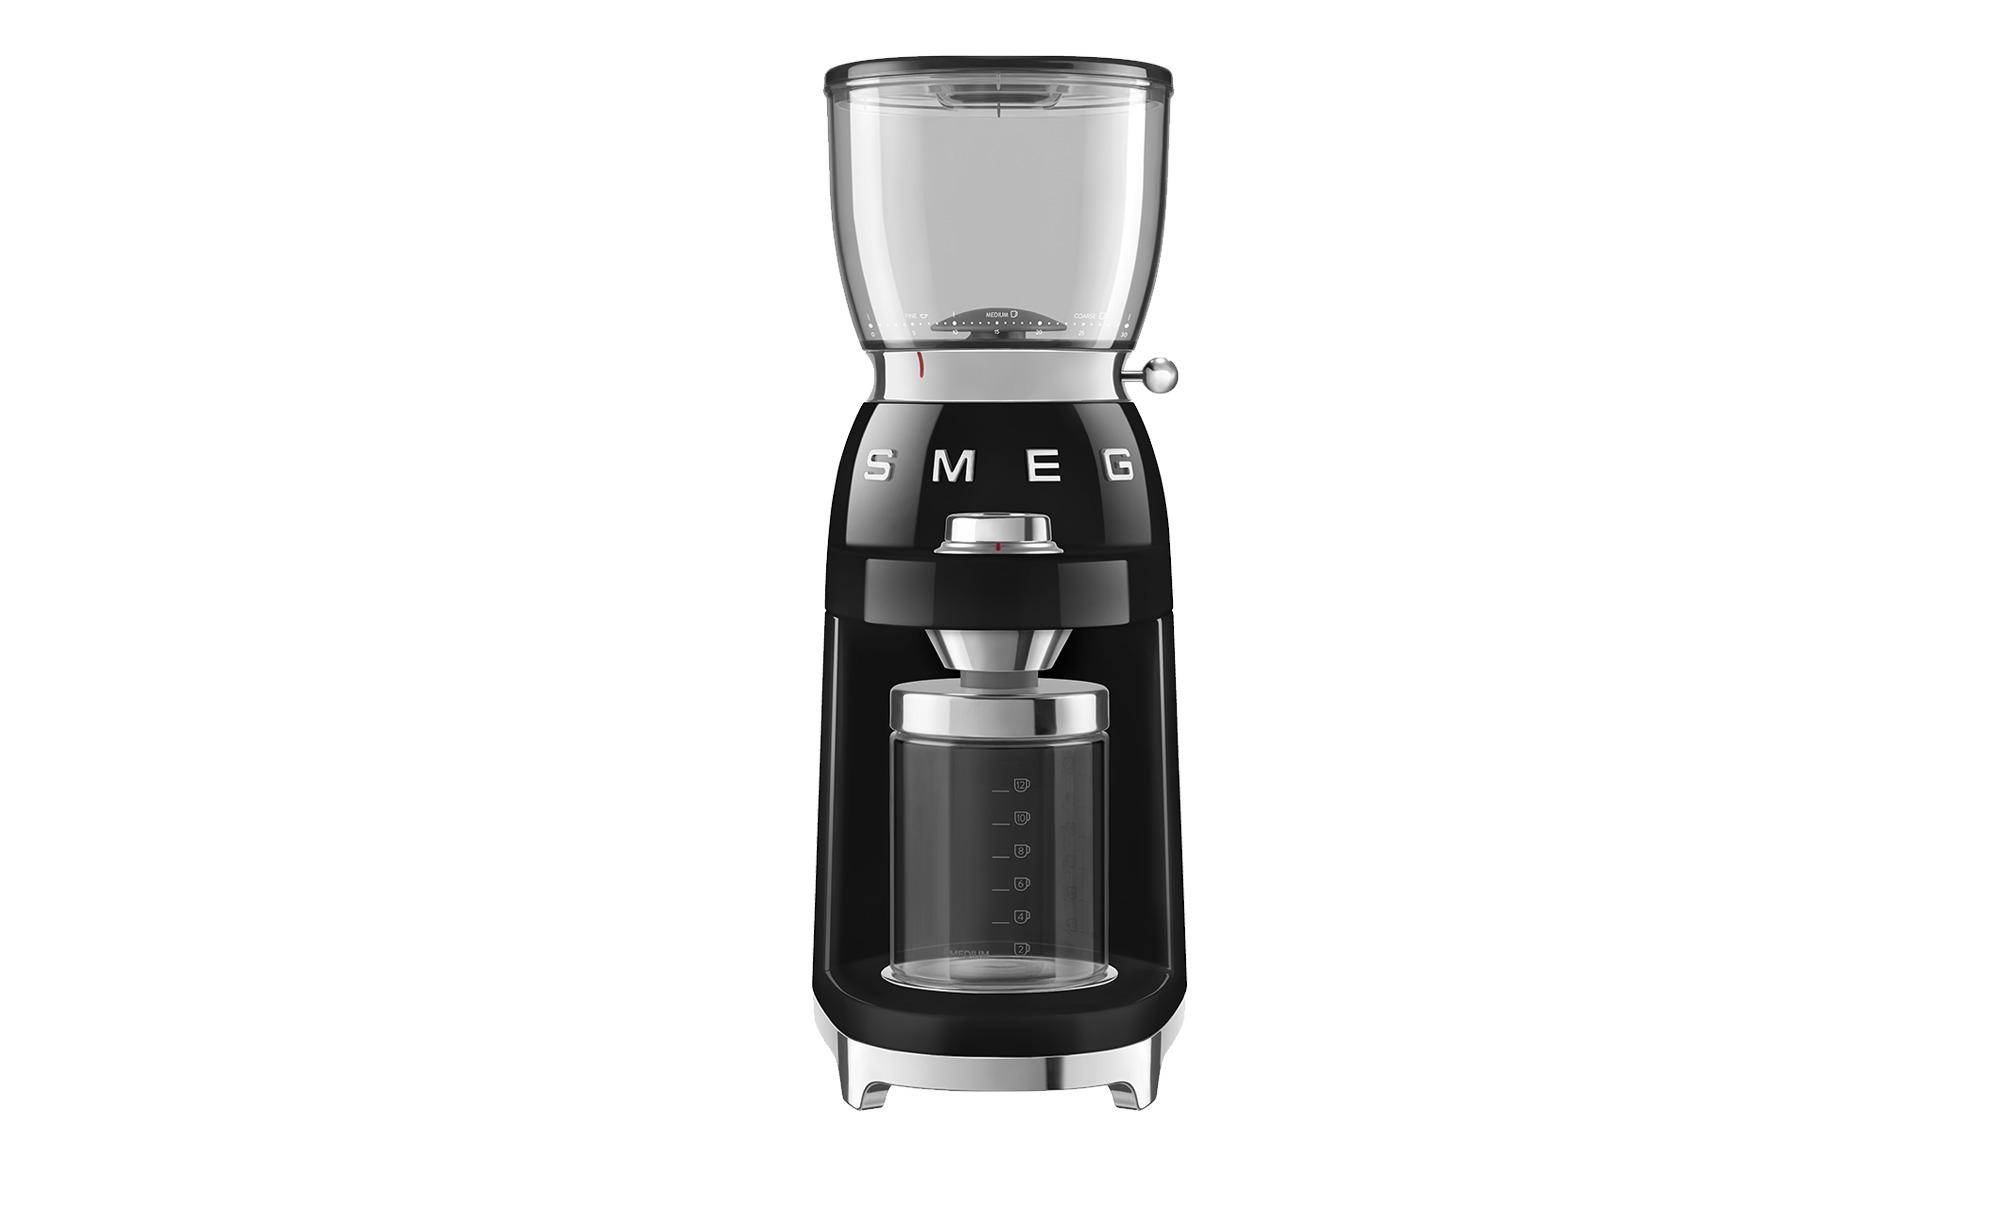 smeg Kaffeemühle  CGF01BLEU - schwarz - Kunststoff, Aluminium - 25 cm - 46 cm - 17 cm - Elektrokleingeräte > Kaffee & Espressomaschinen - Möbel Kraft | Küche und Esszimmer > Kaffee und Tee > Espressomaschinen | smeg